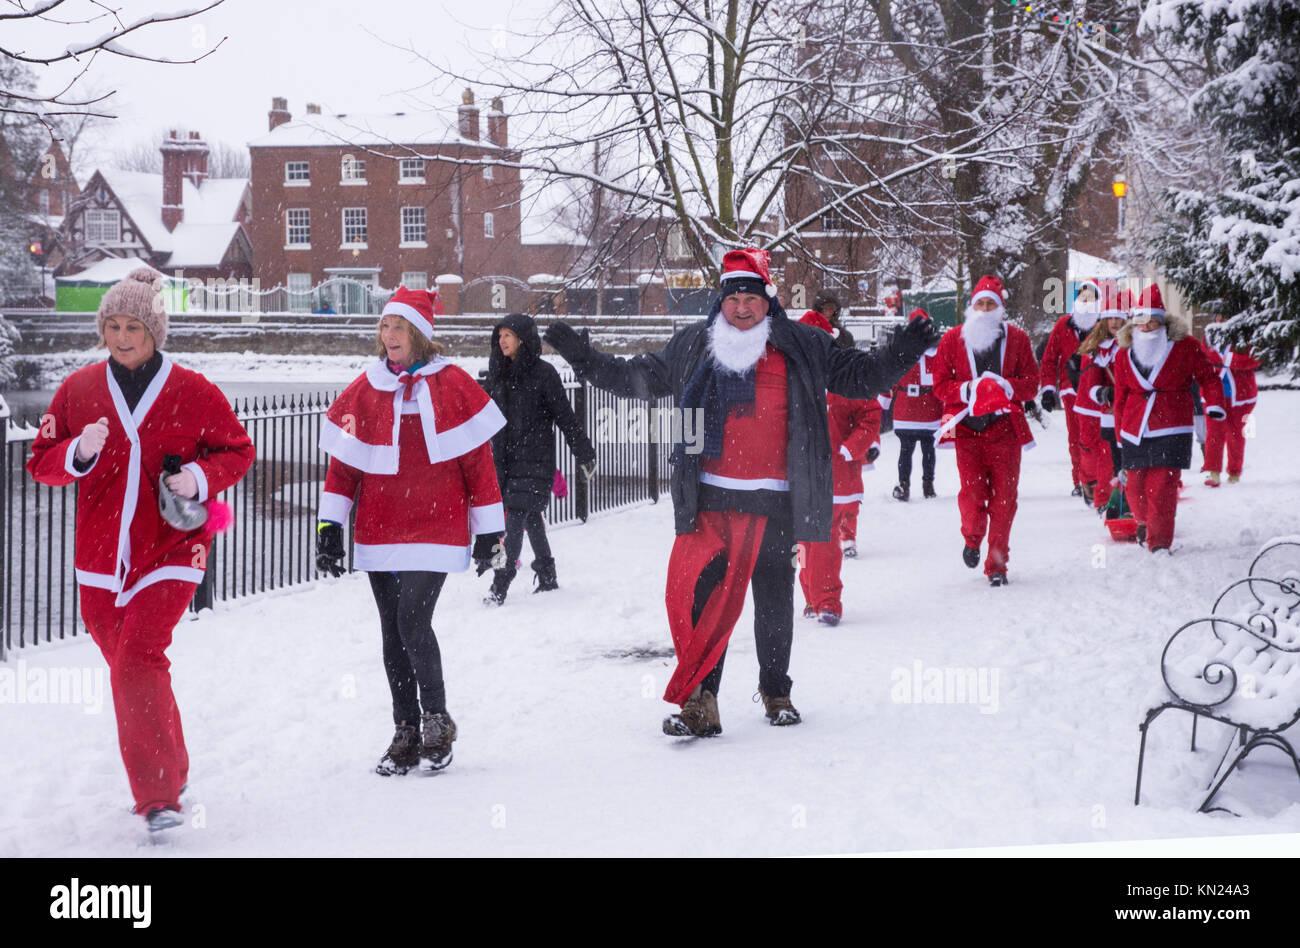 Lichfield, UK. 10th Dec, 2017. People taking part in the Lichfield Santa Dash go past Minster Pool dressed in Santa - Stock Image